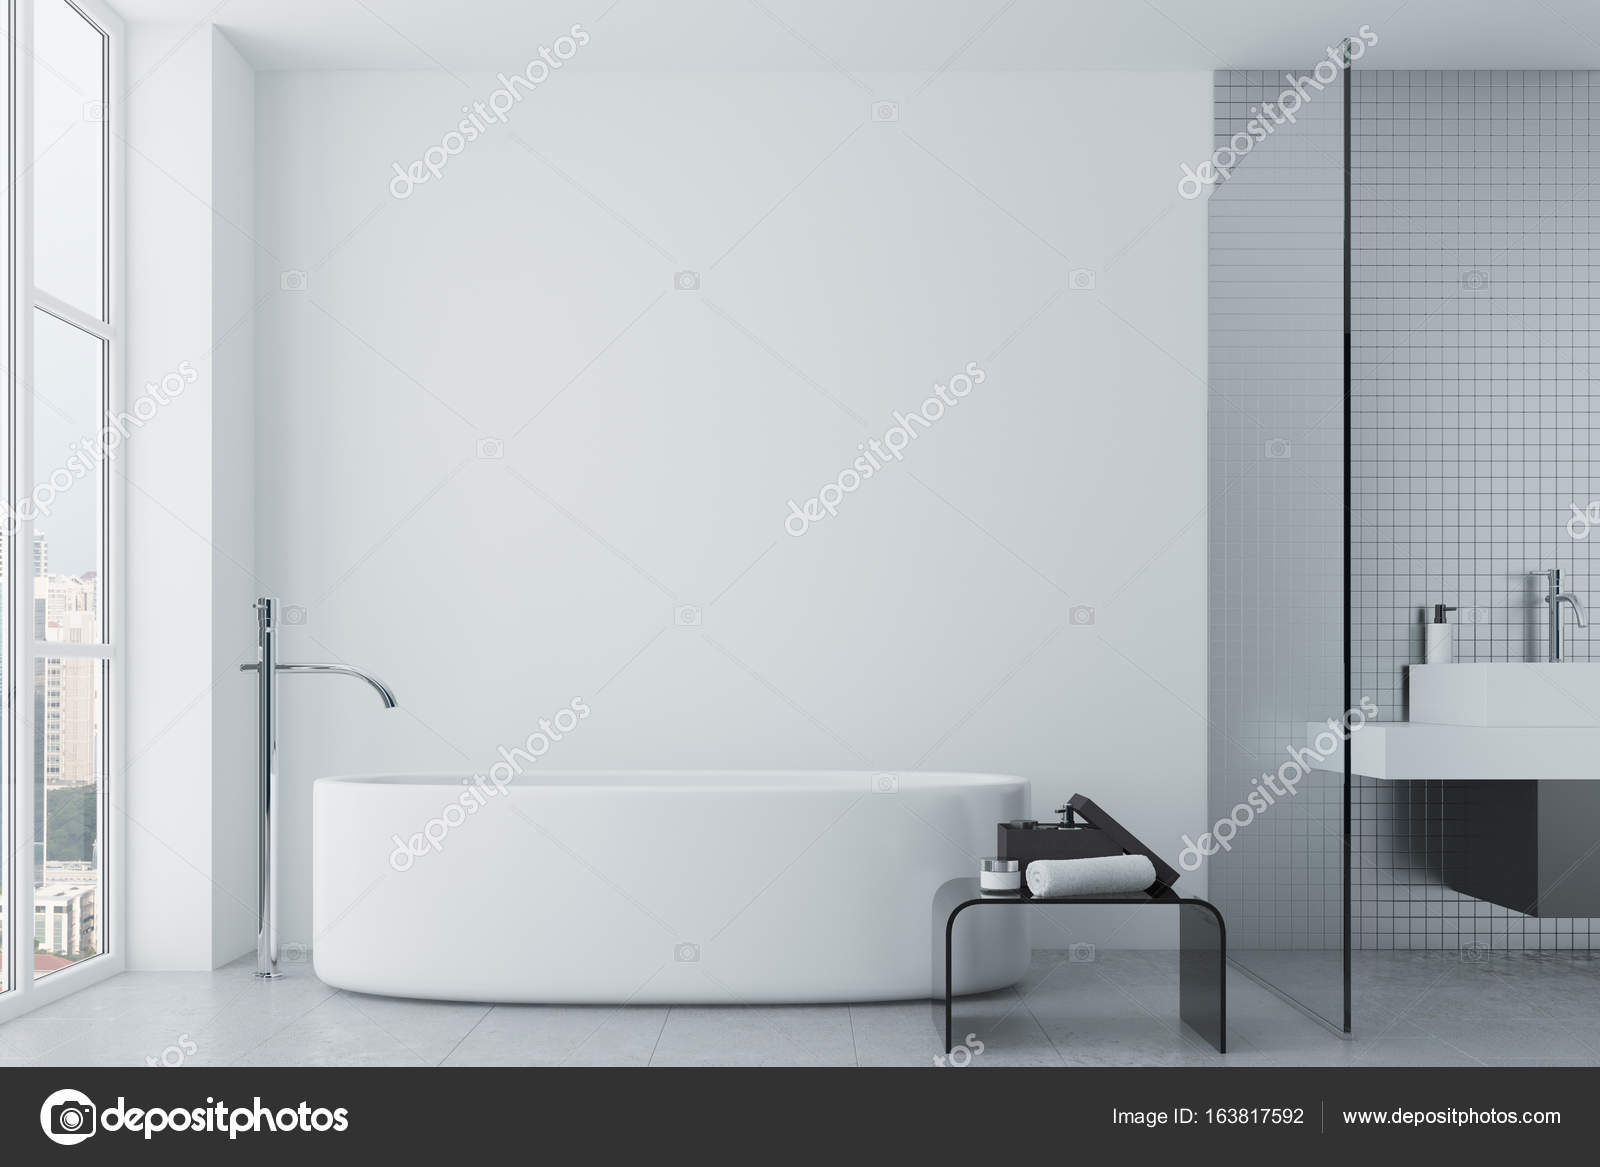 Witte Badkamer Wandtegels : Witte badkamer tegels en ronde kuip u stockfoto denisismagilov